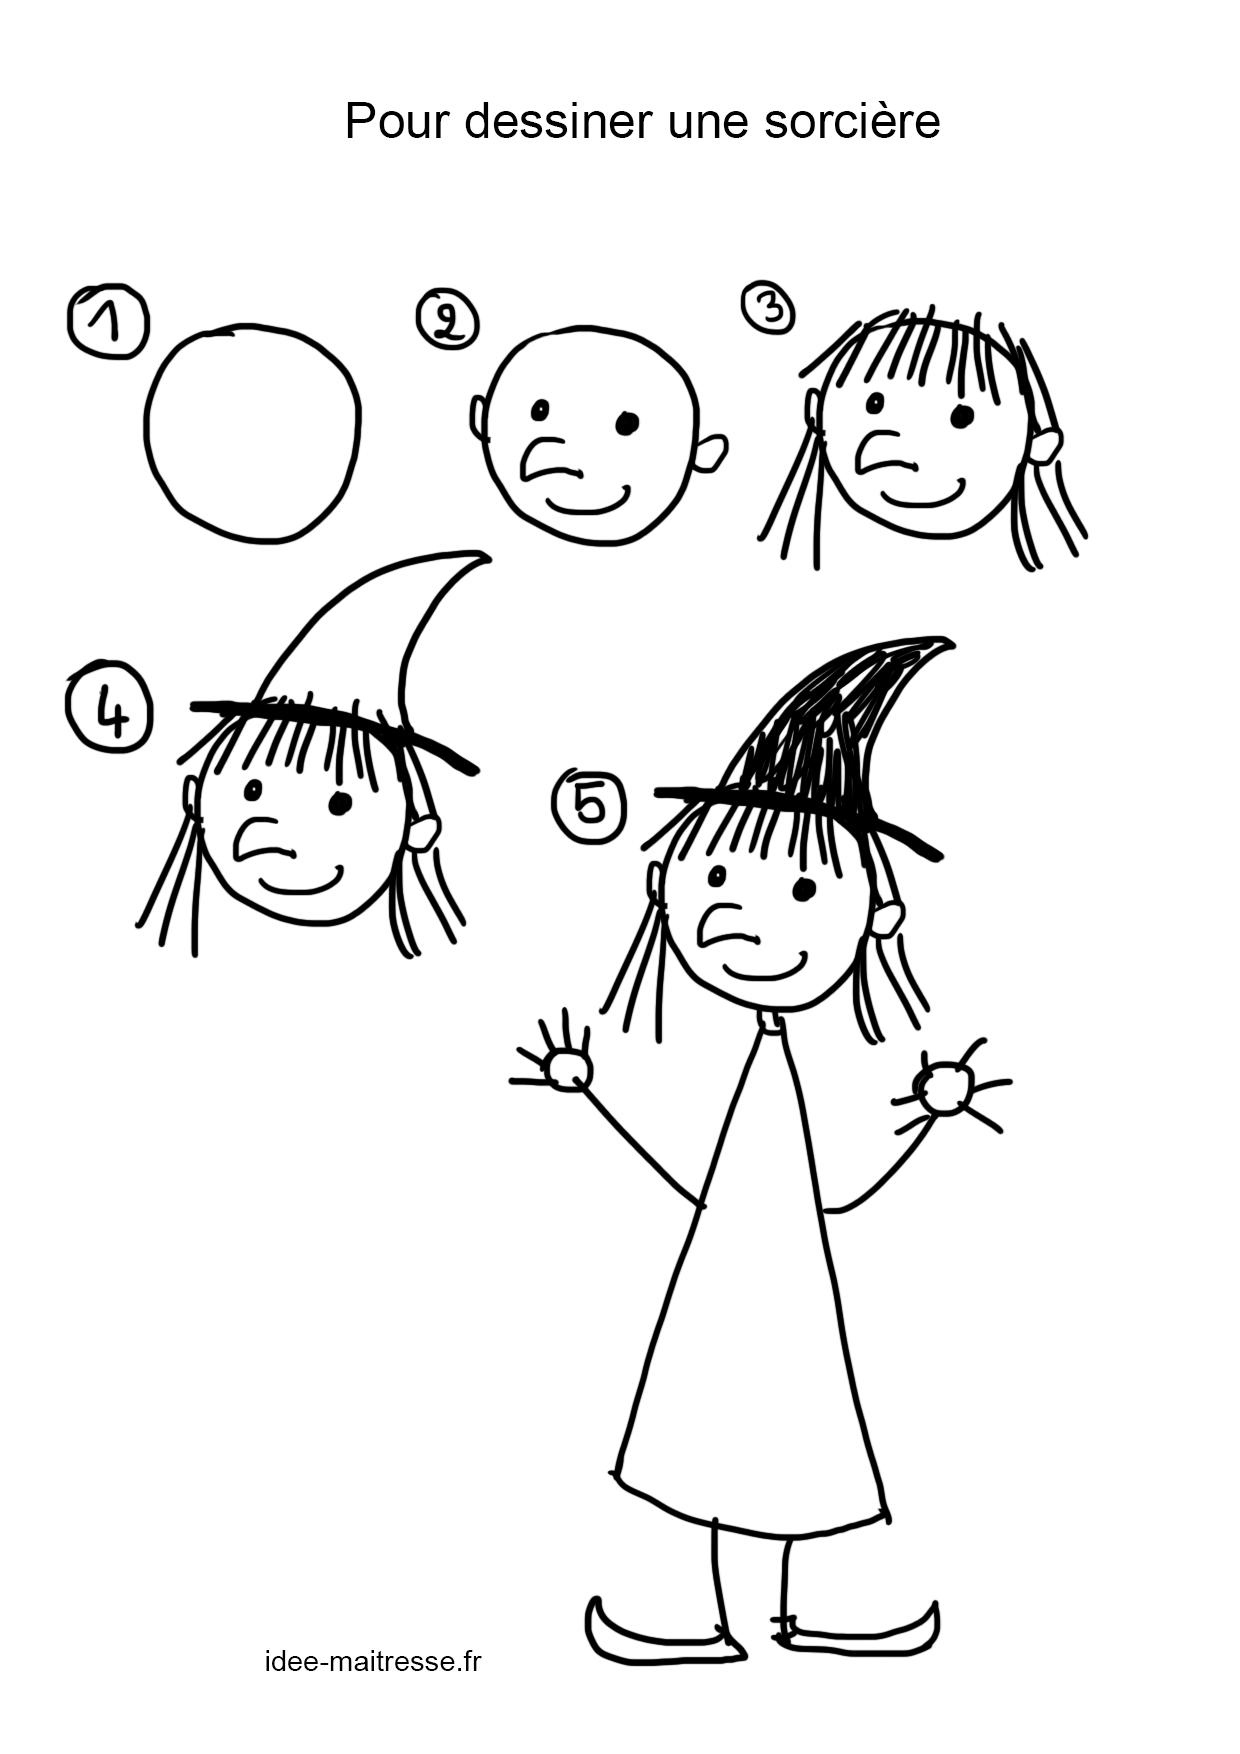 Apprendre A Dessiner Idee Maitresse Editions Equitables De Ressources Pedagogiques